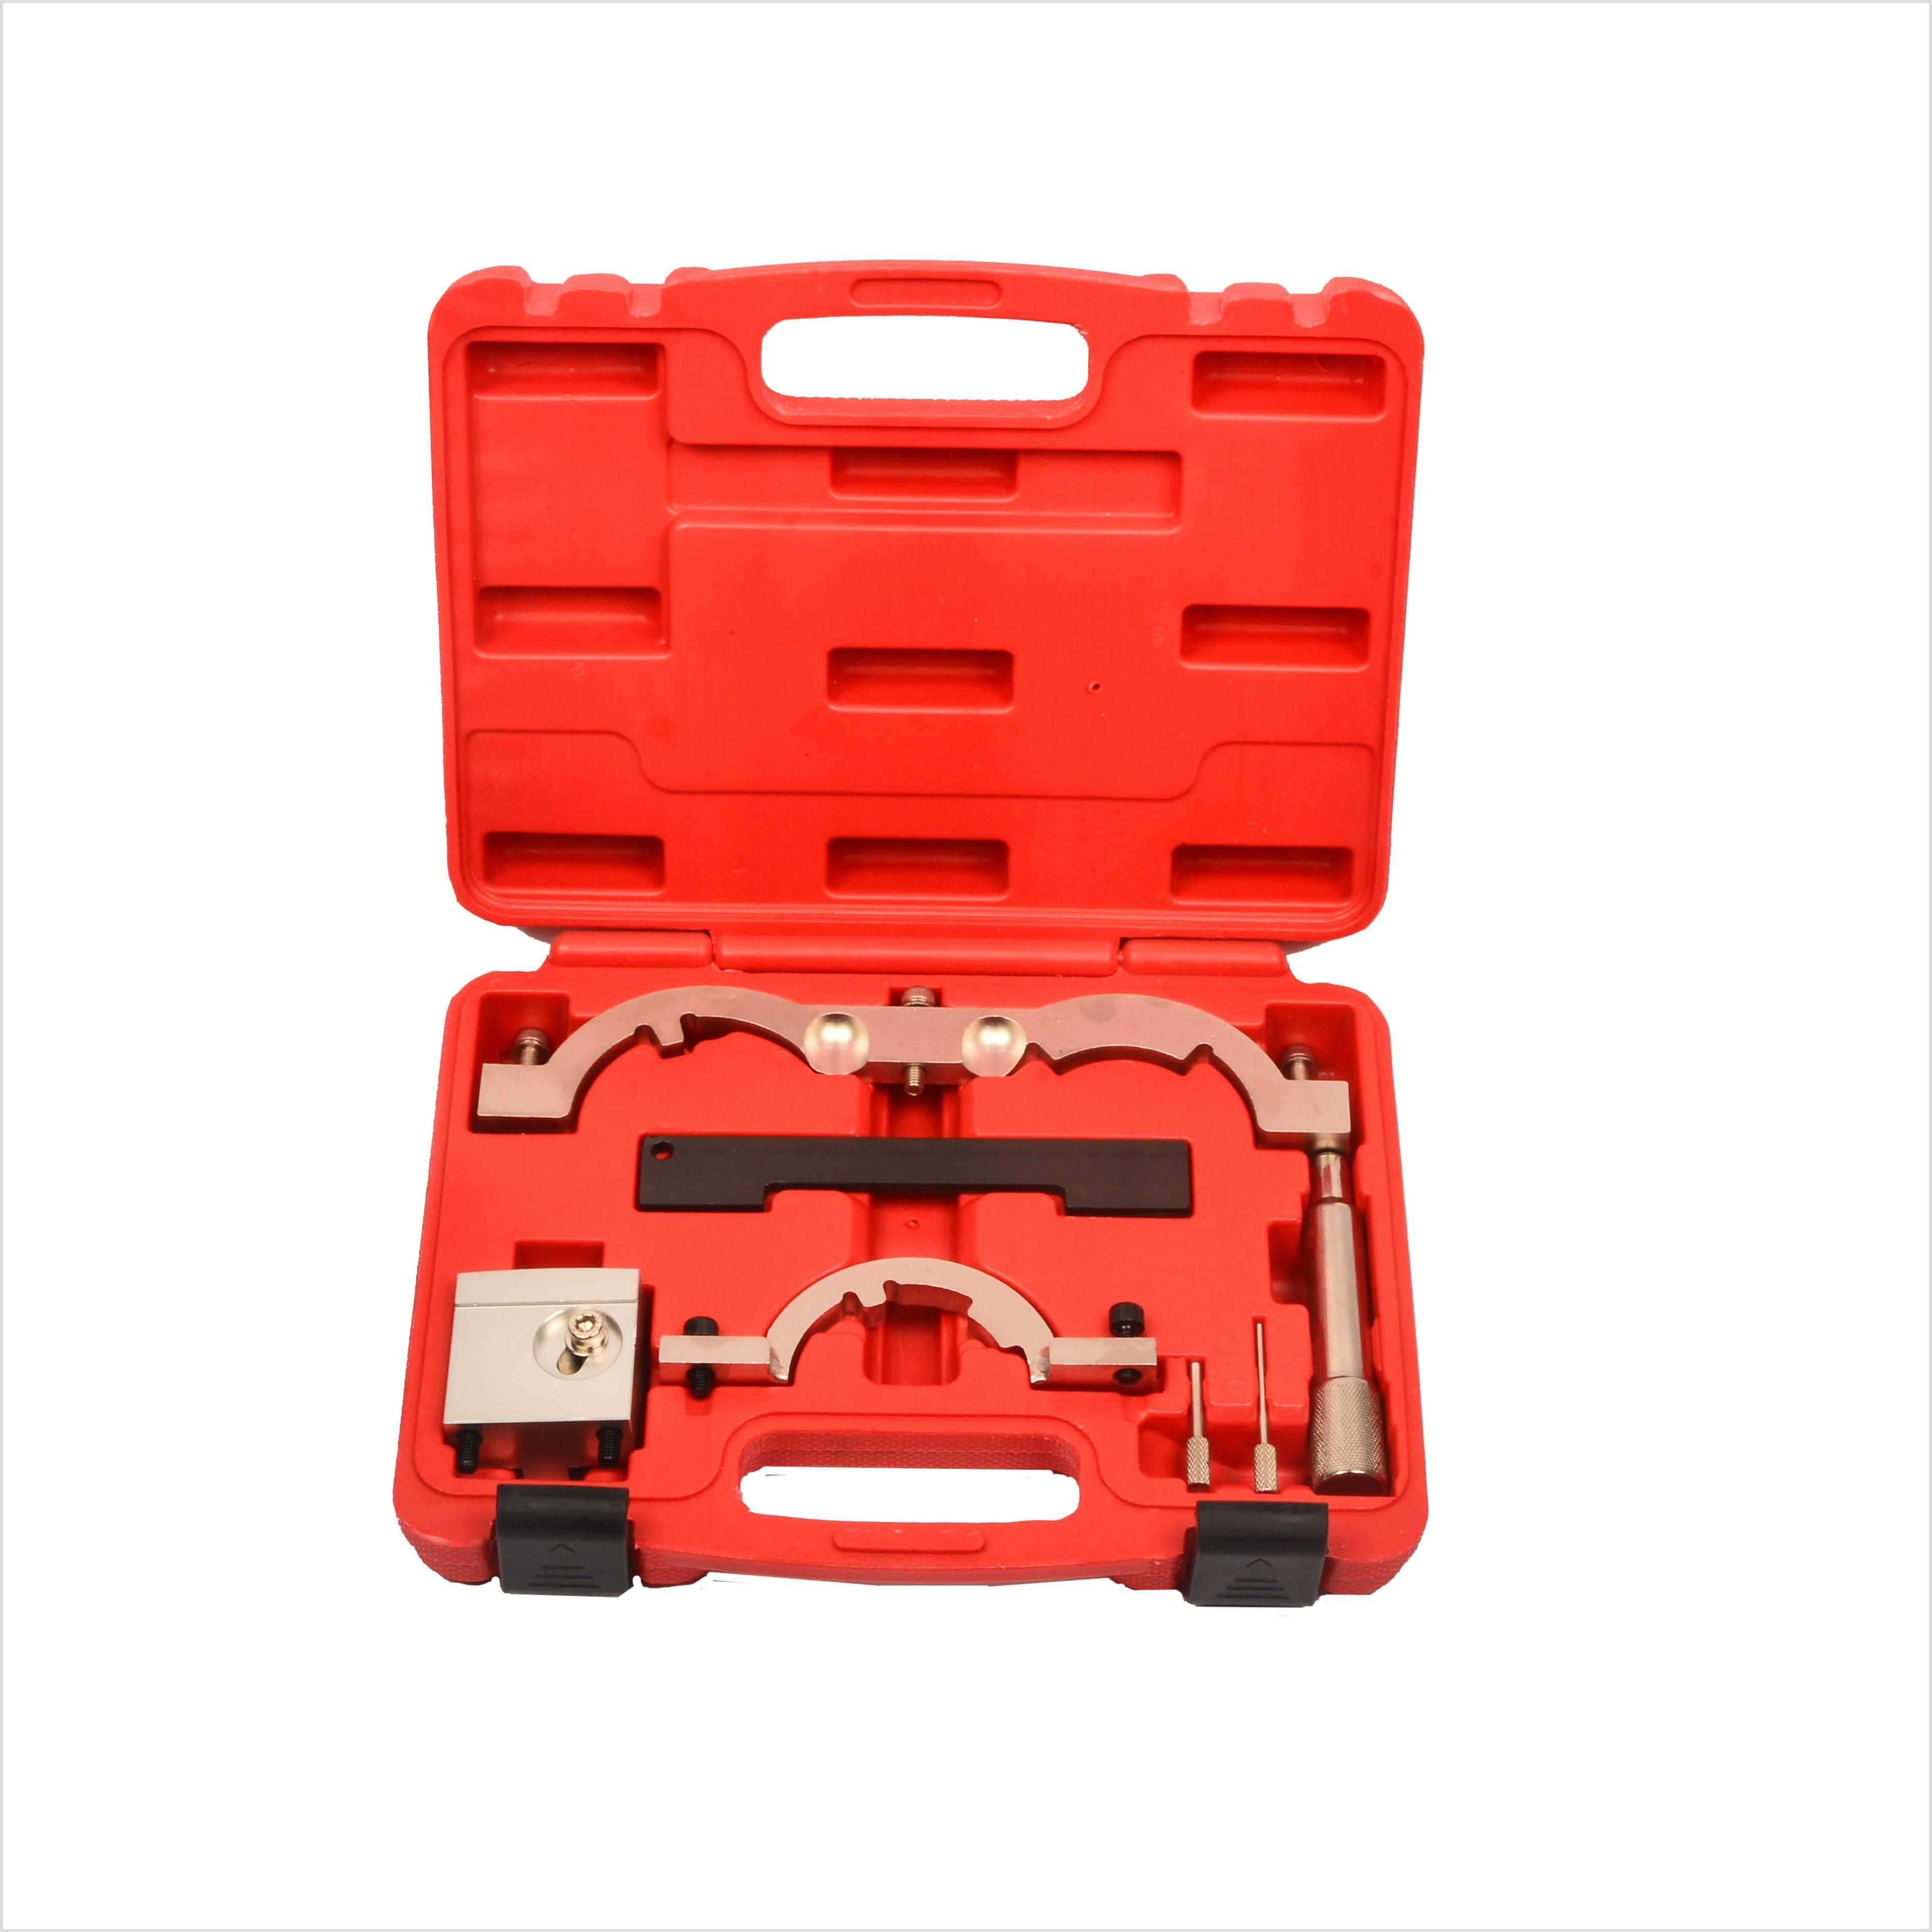 NUOVO Motore Timing Tool Kit Set Per Opel/Vauxhall Chevrolet 1.0 1.2 1.4 Turbo